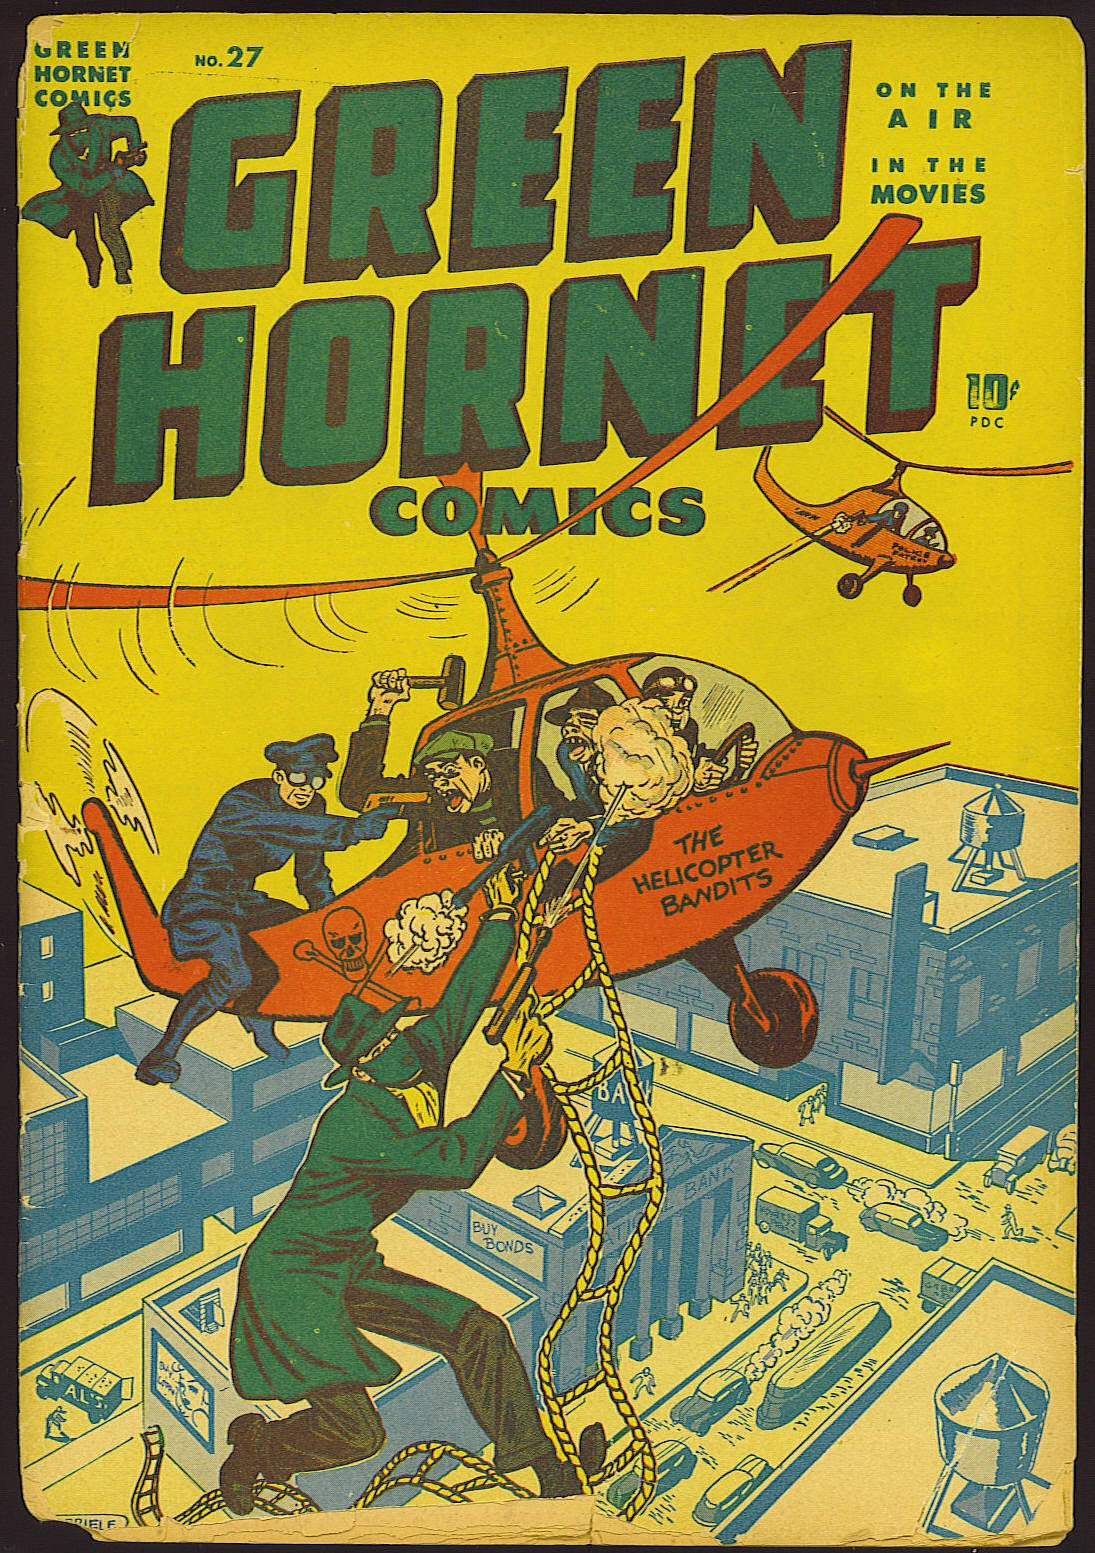 Green Hornet Comics 27 Page 1